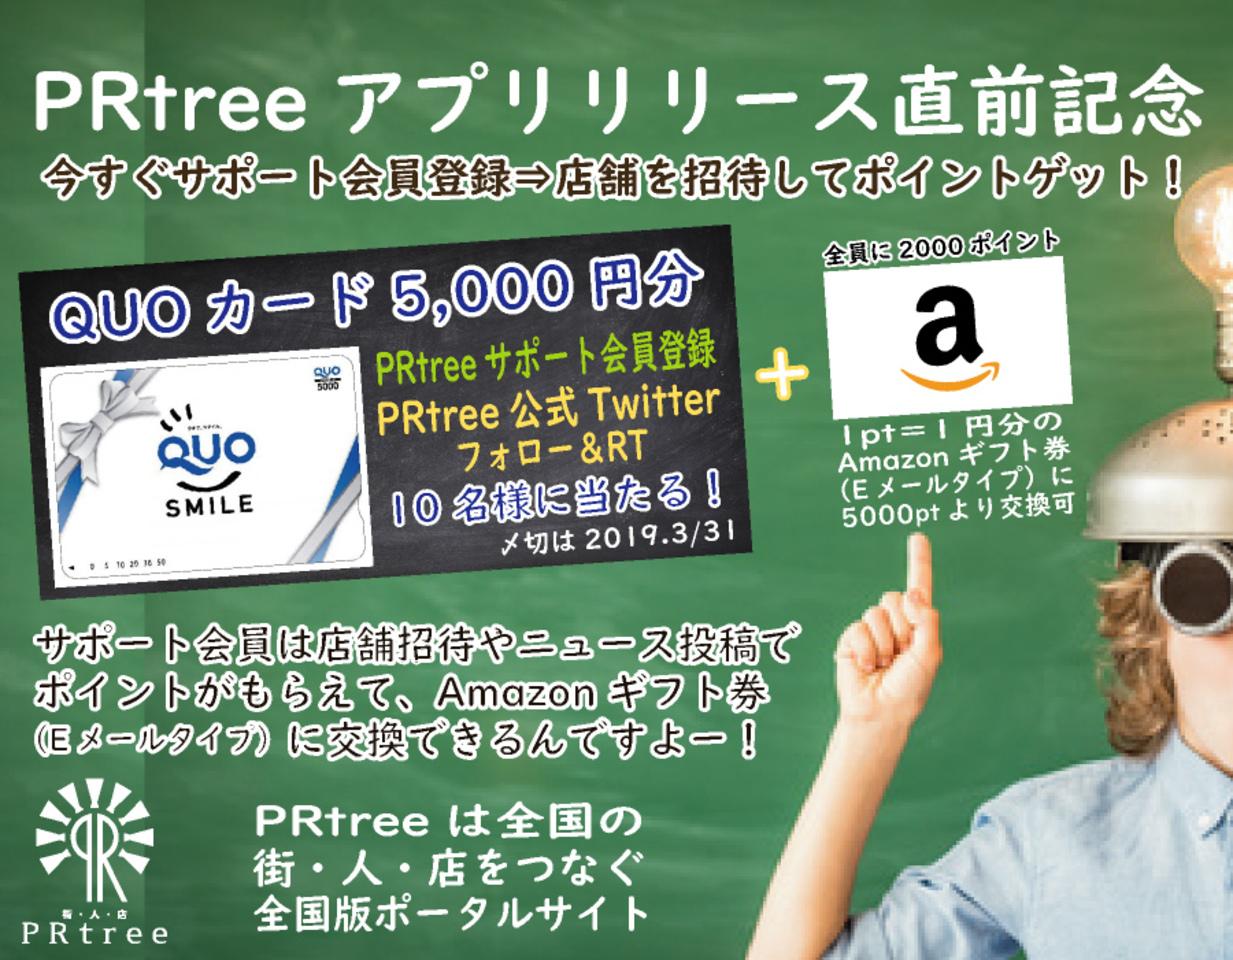 PRtreeアプリリリース直前記念キャンペーン!